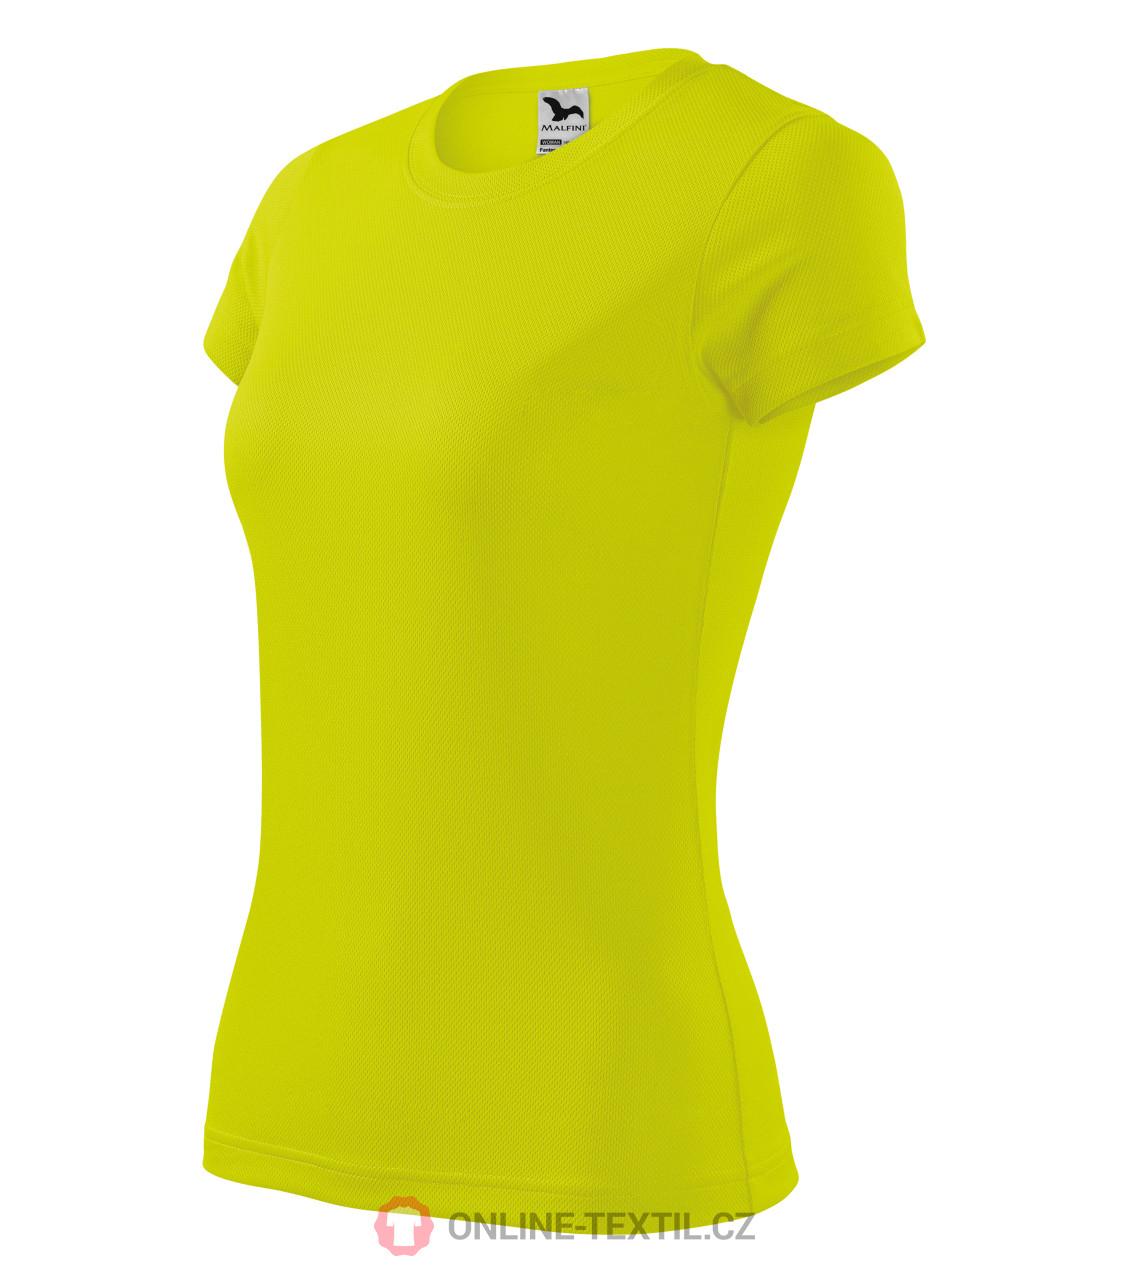 9cb69430662c1 ADLER CZECH Dámske športové tričko Fantasy 140 - neon yellow z ...